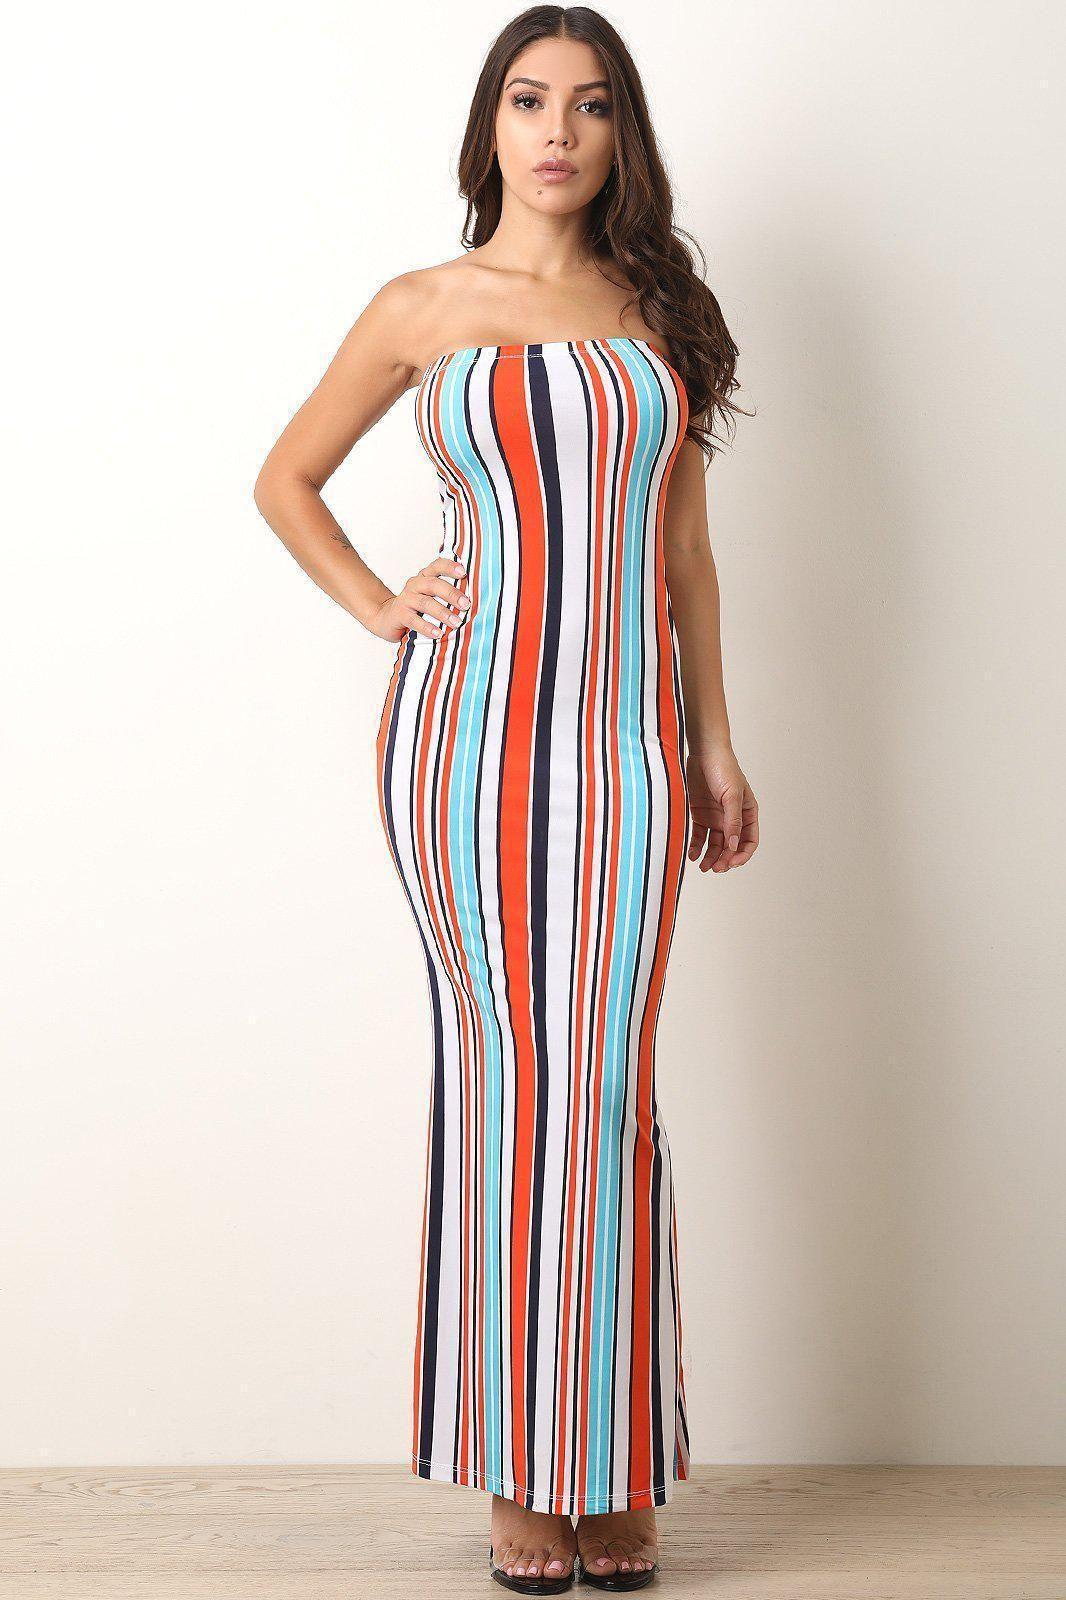 Vertical Striped Tube Maxi Dress Tube Maxi Dresses Maxi Dress Occasion Maxi Dresses [ 1600 x 1066 Pixel ]